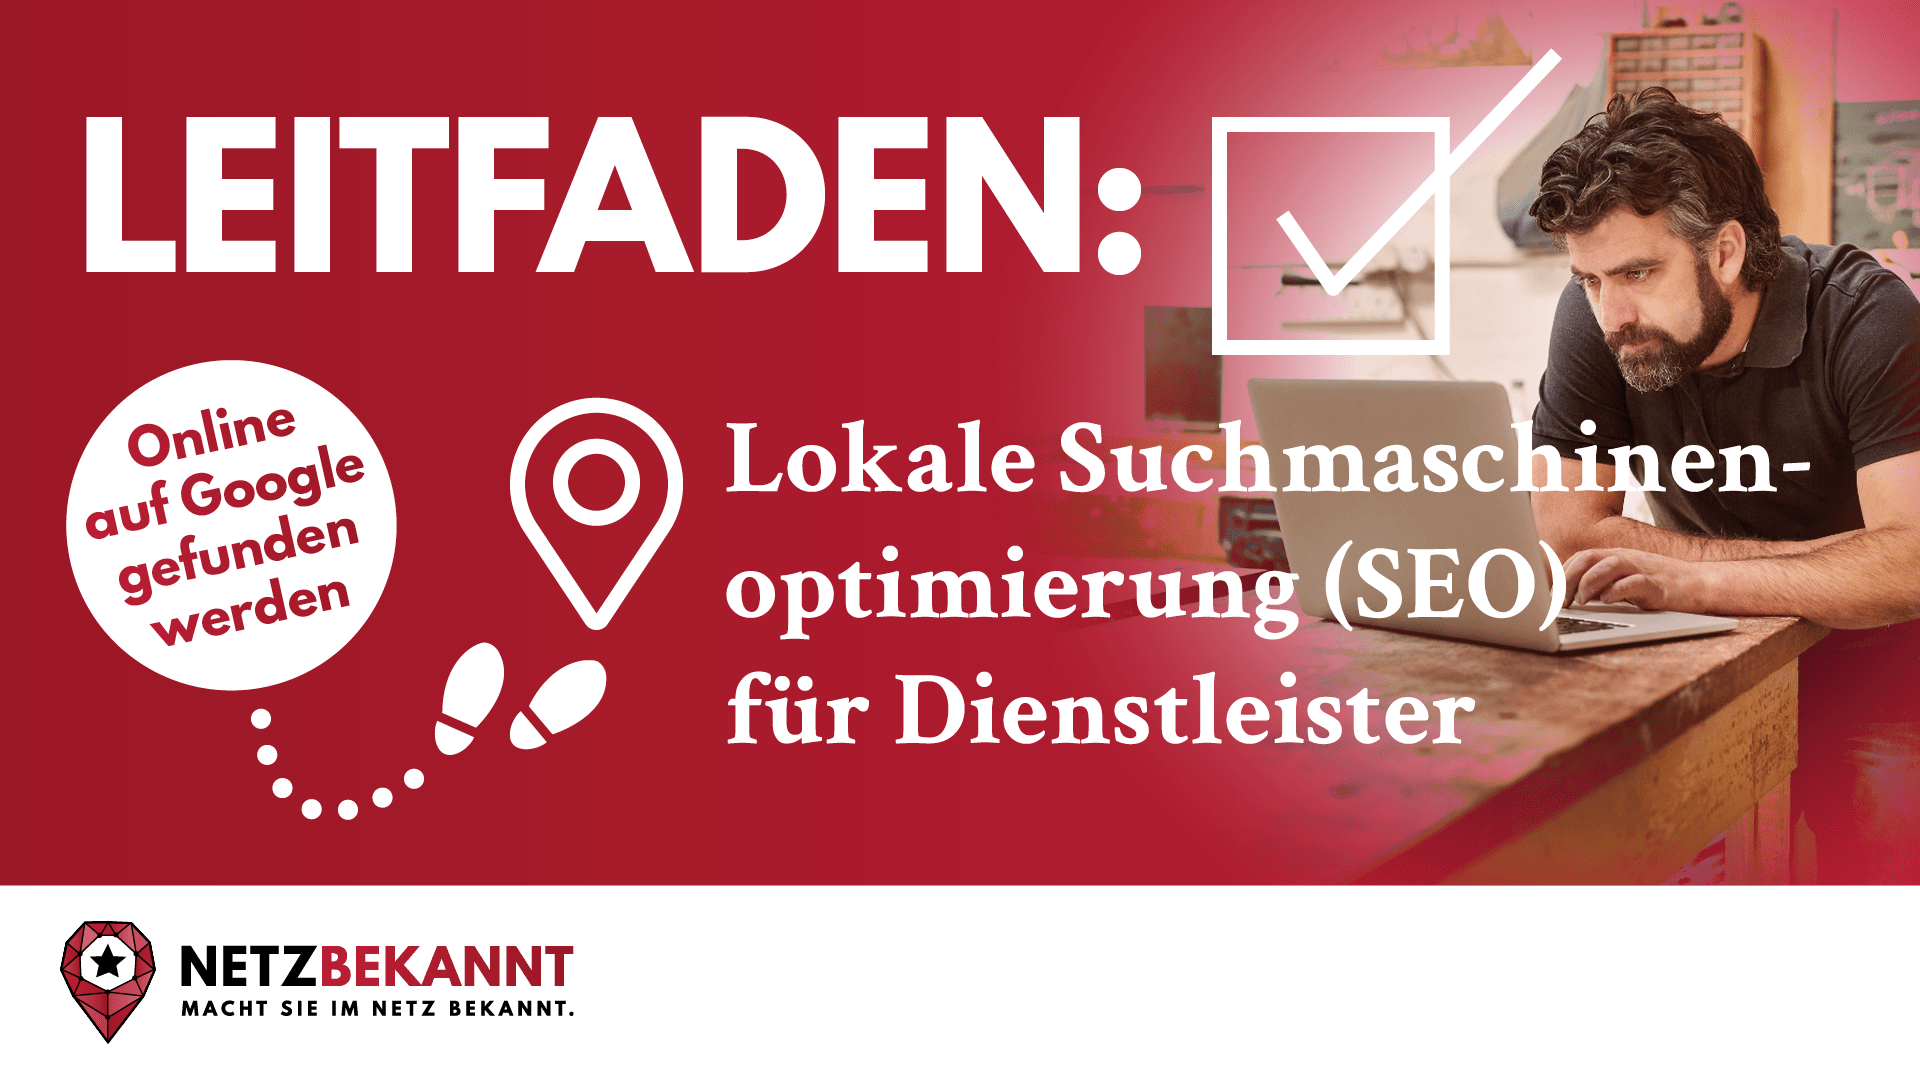 Lokale Suchmaschinenoptimierung (SEO) selber machen